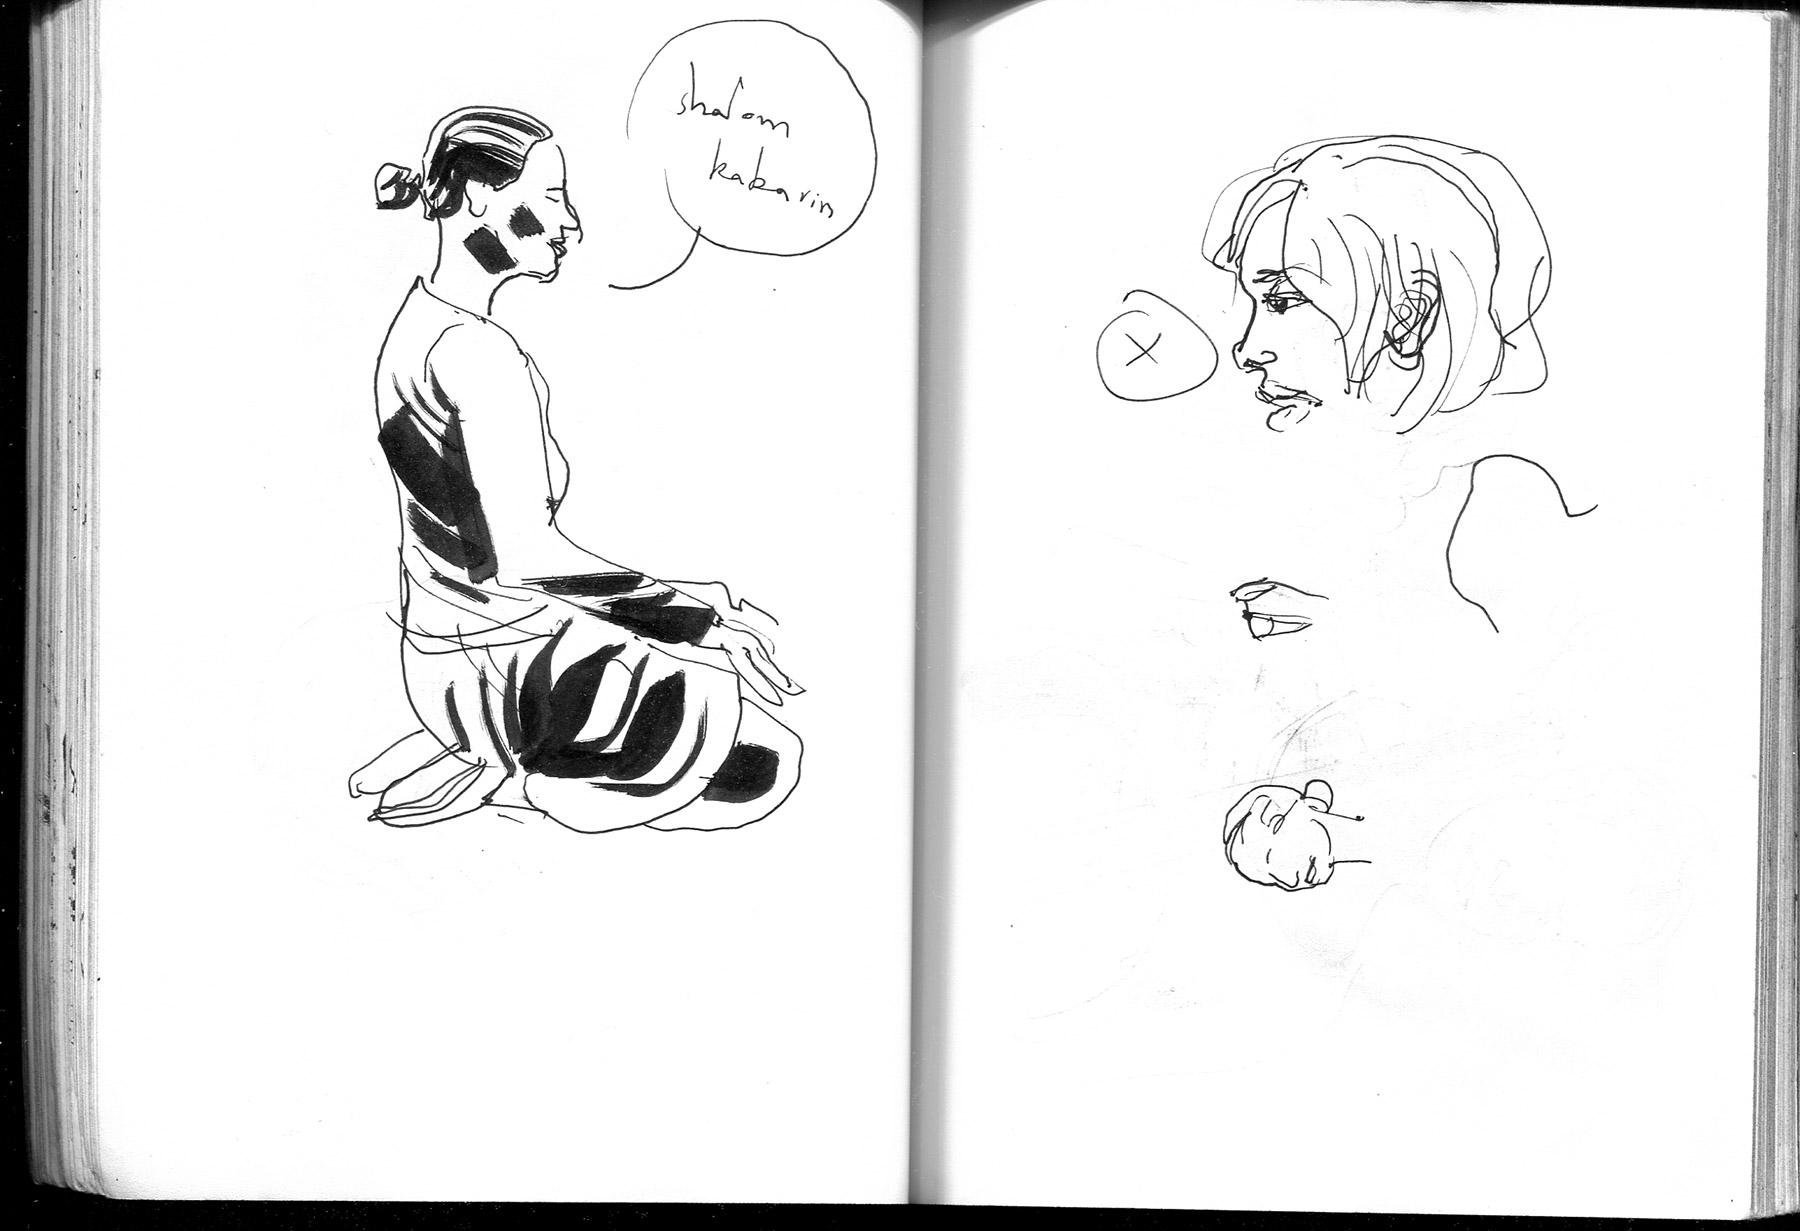 davidm_sketches_2014_08-052.jpg